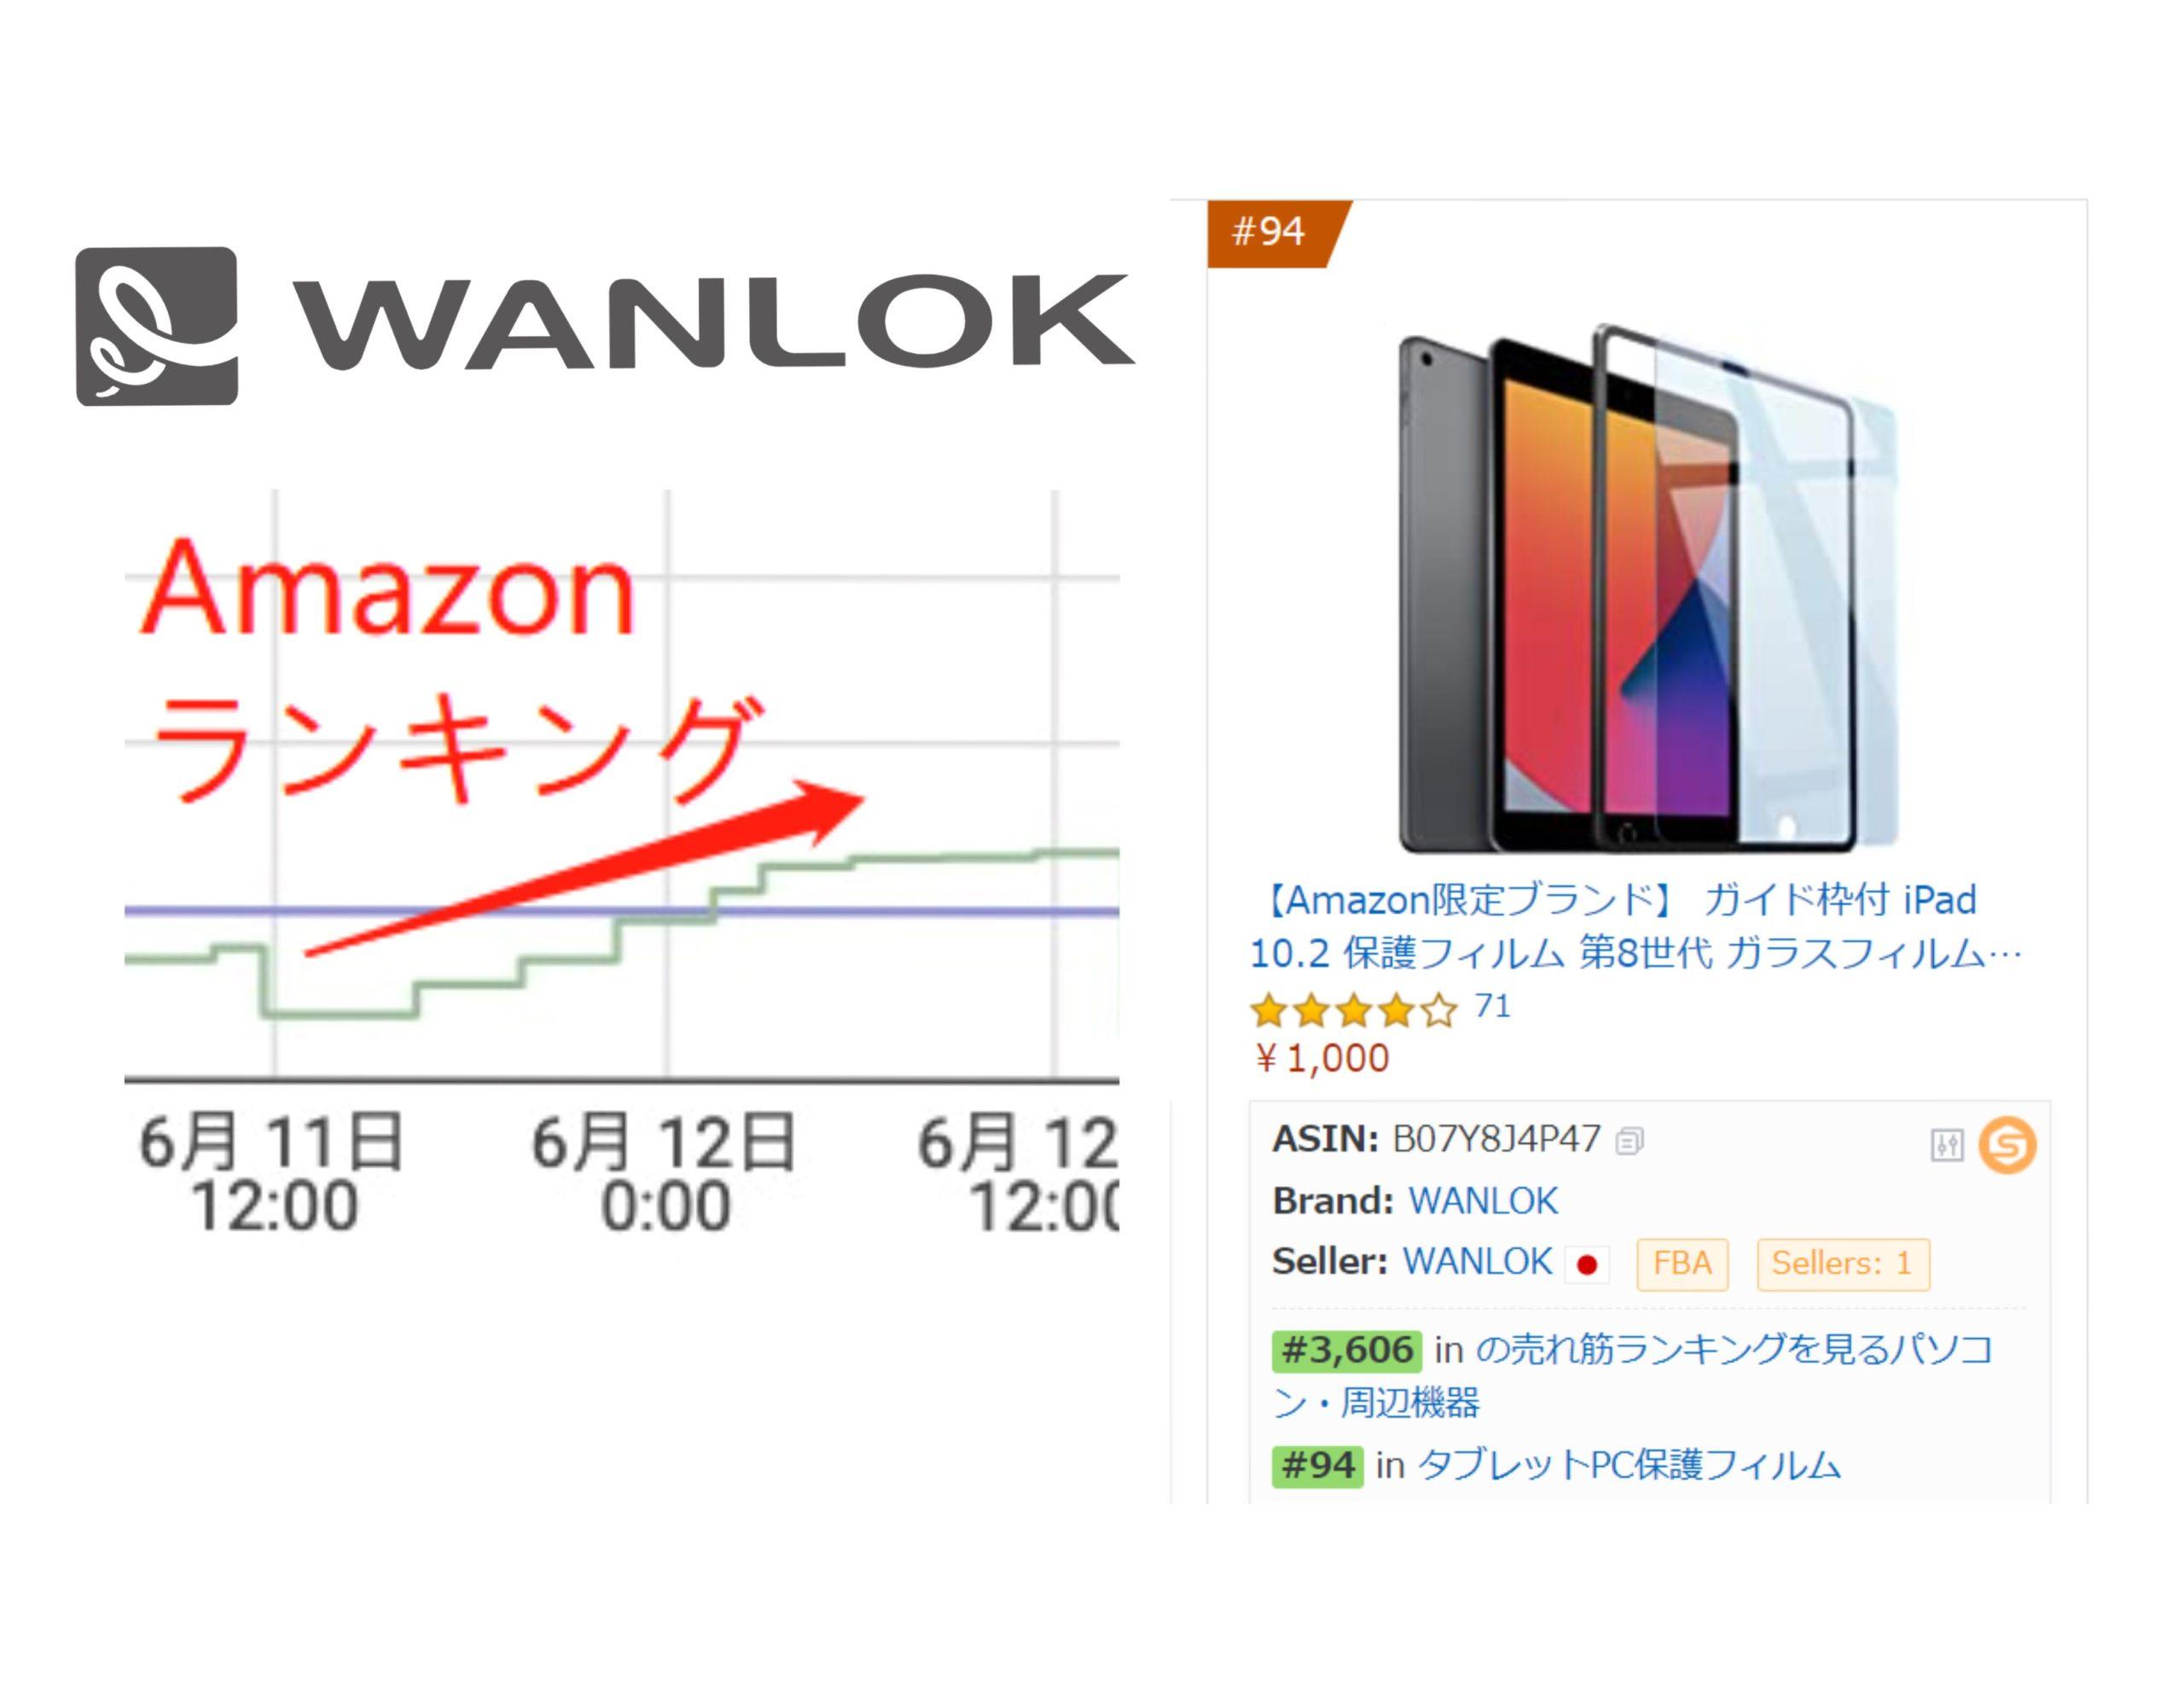 WANLOK 『人気タブレット各種対応保護フィルム 売上210%を達成のご報告』 アマゾン限定ブランド認定後の価格見直しにより販売数大幅UP iPad対応フィルムは現在購入数制限中